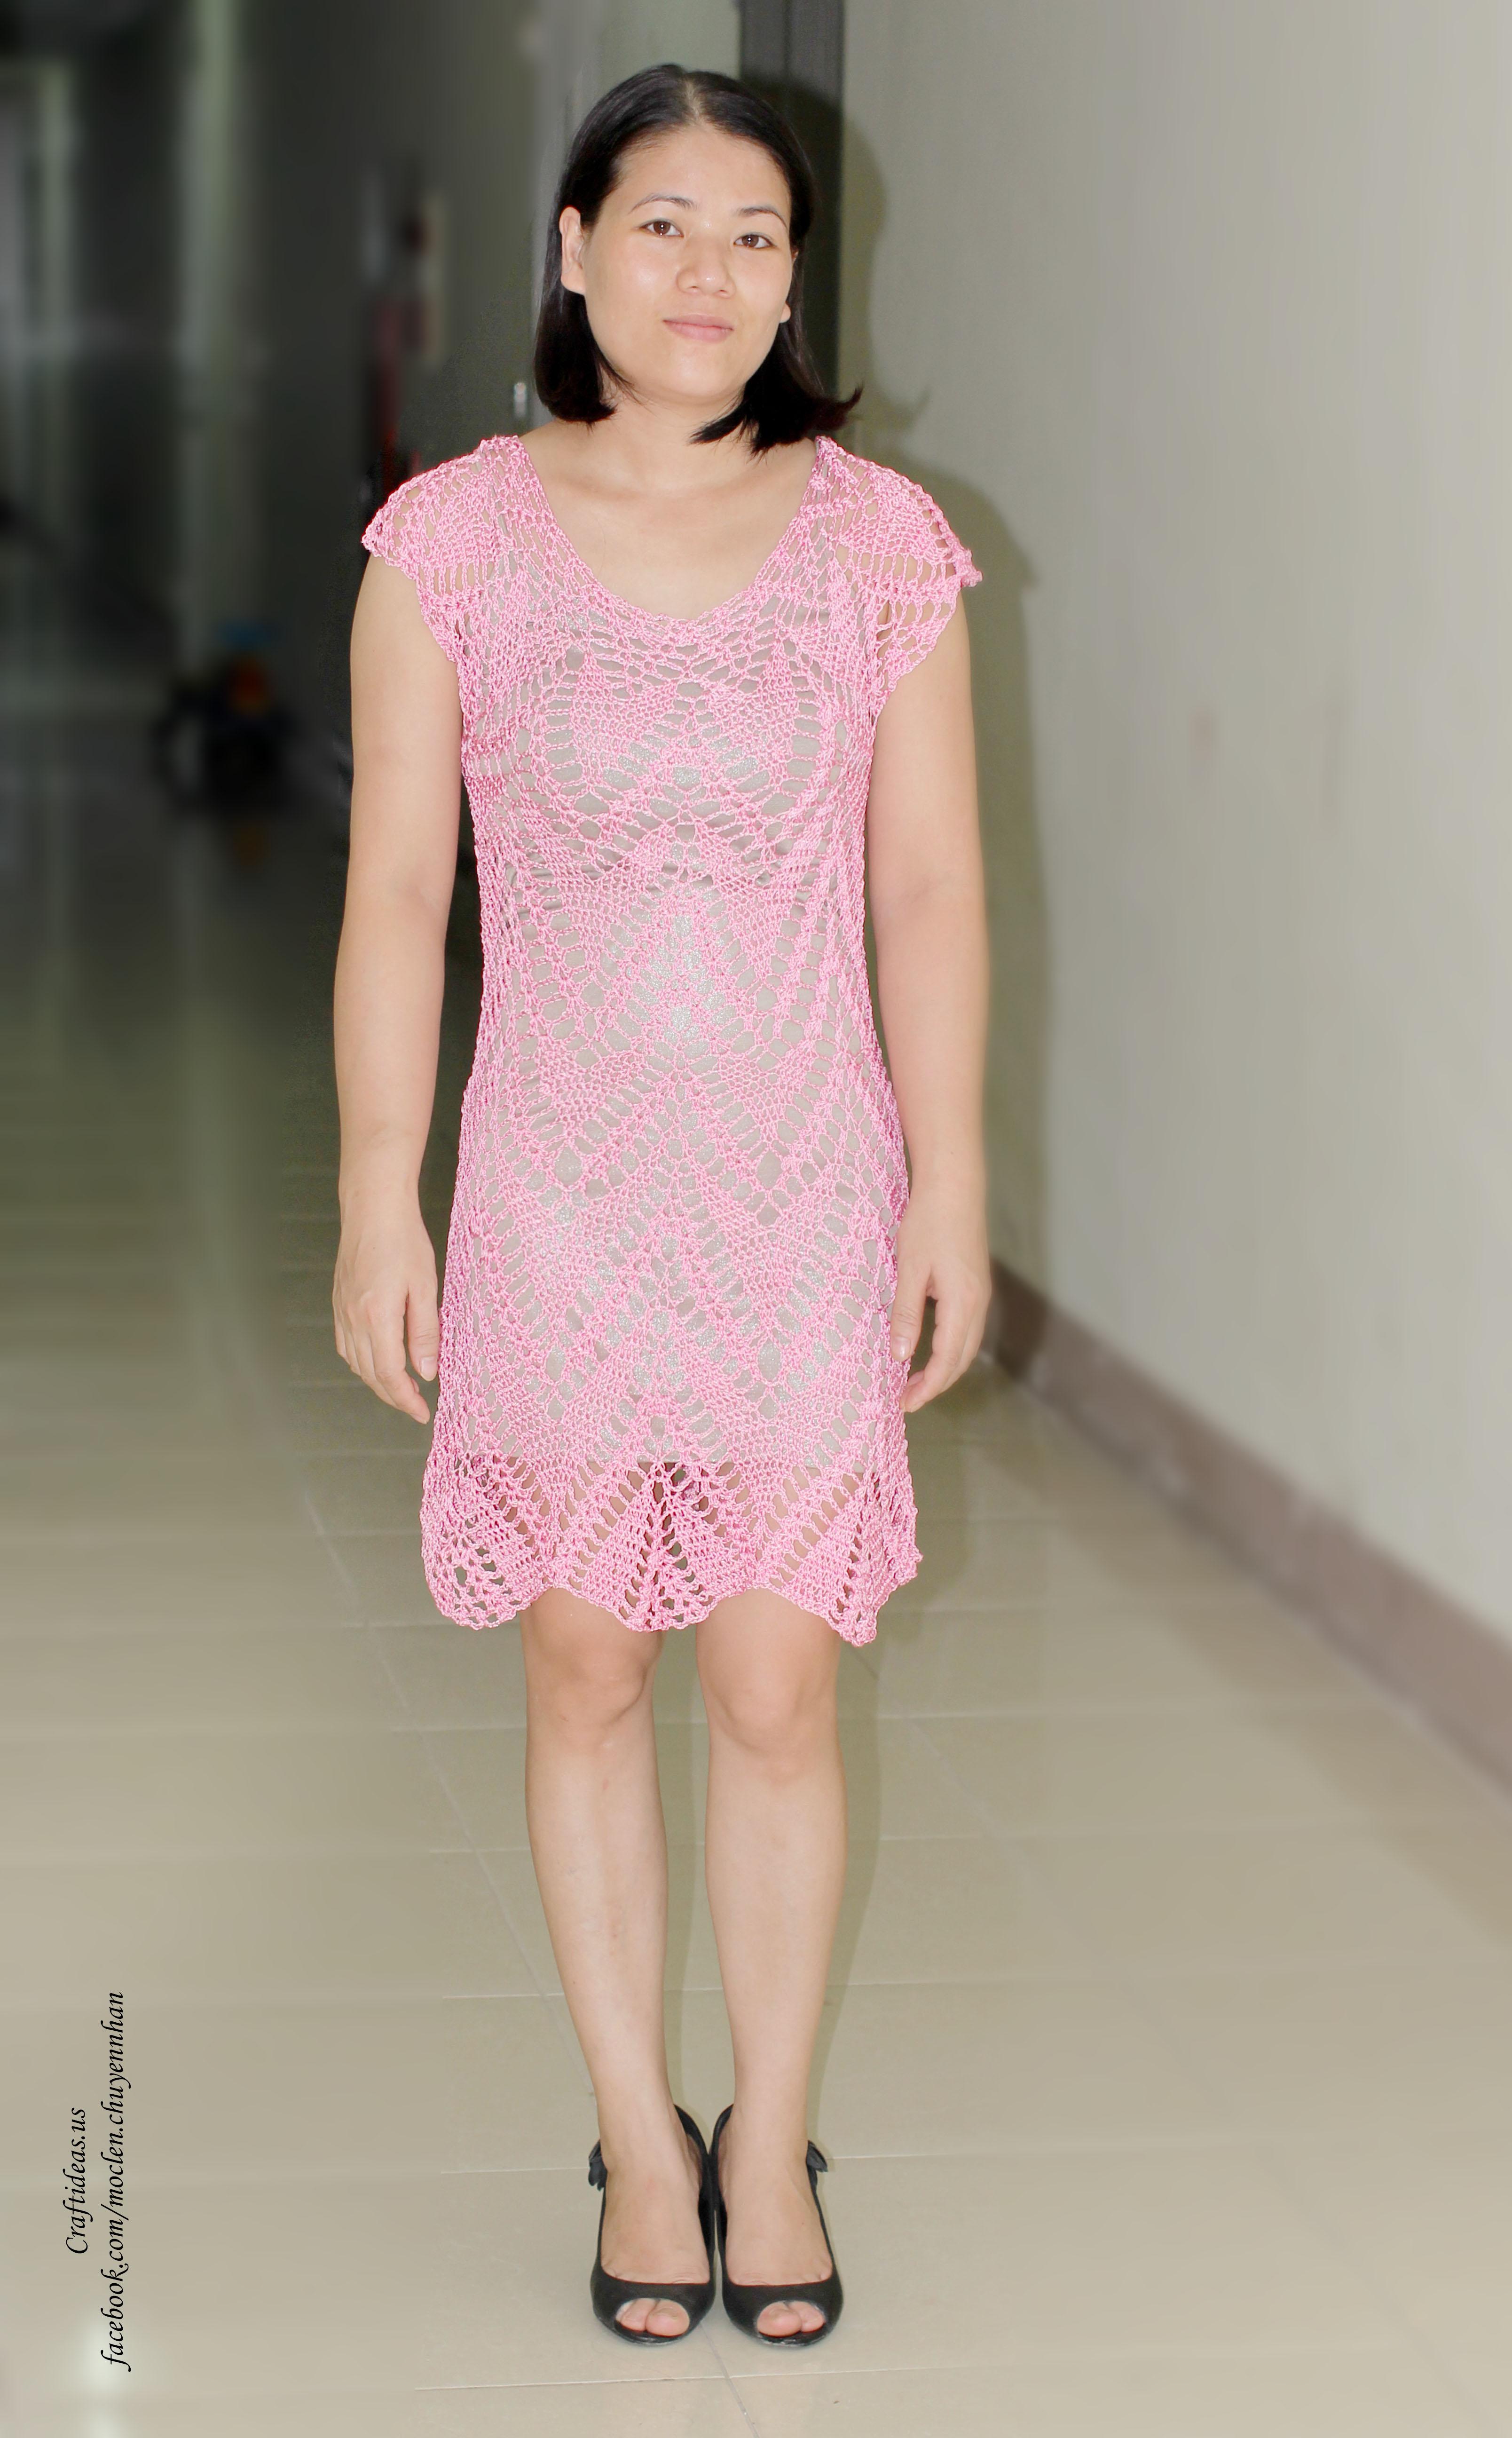 Crochet dress for women